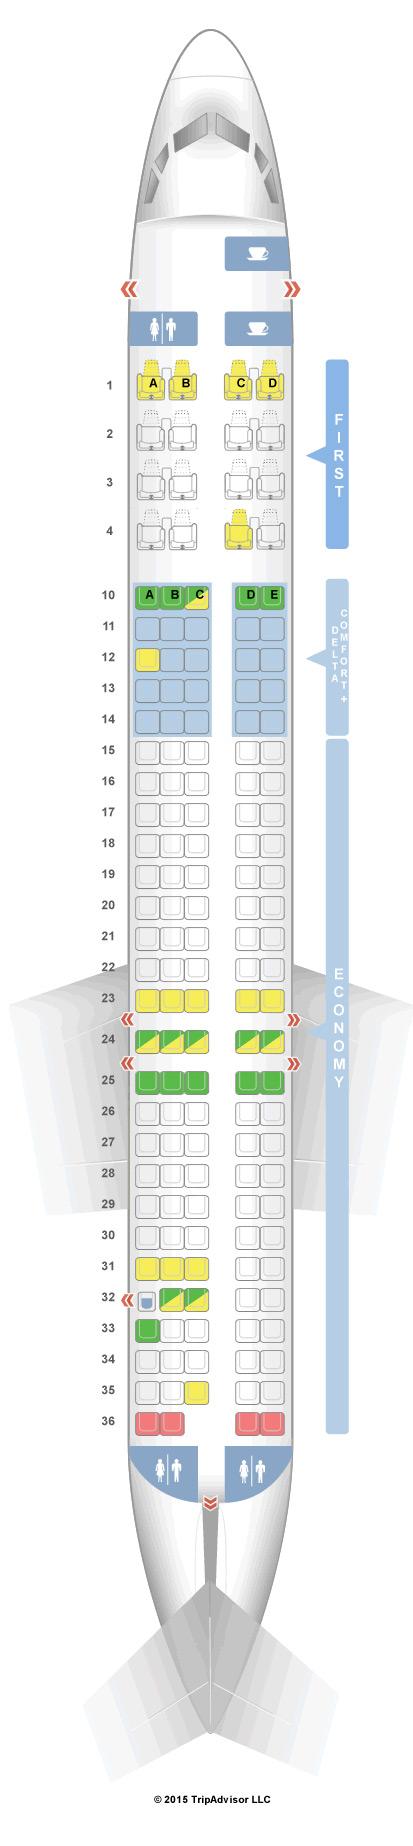 SeatGuru Seat map by tripadvisor to help you choose seats on a ...